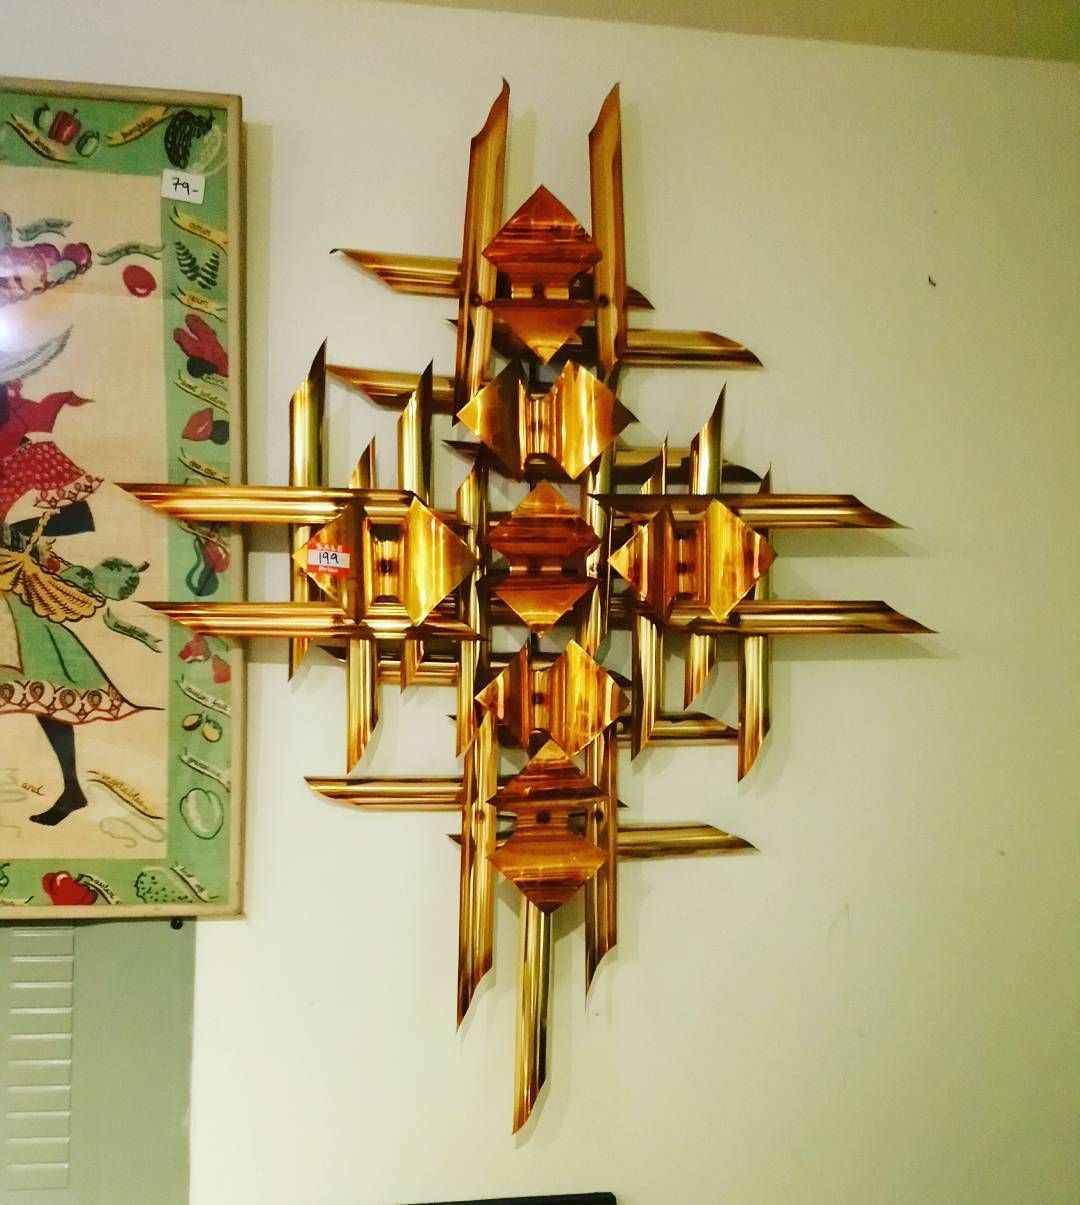 Laege metal wall art refind midcentury midcenturymodern madmen